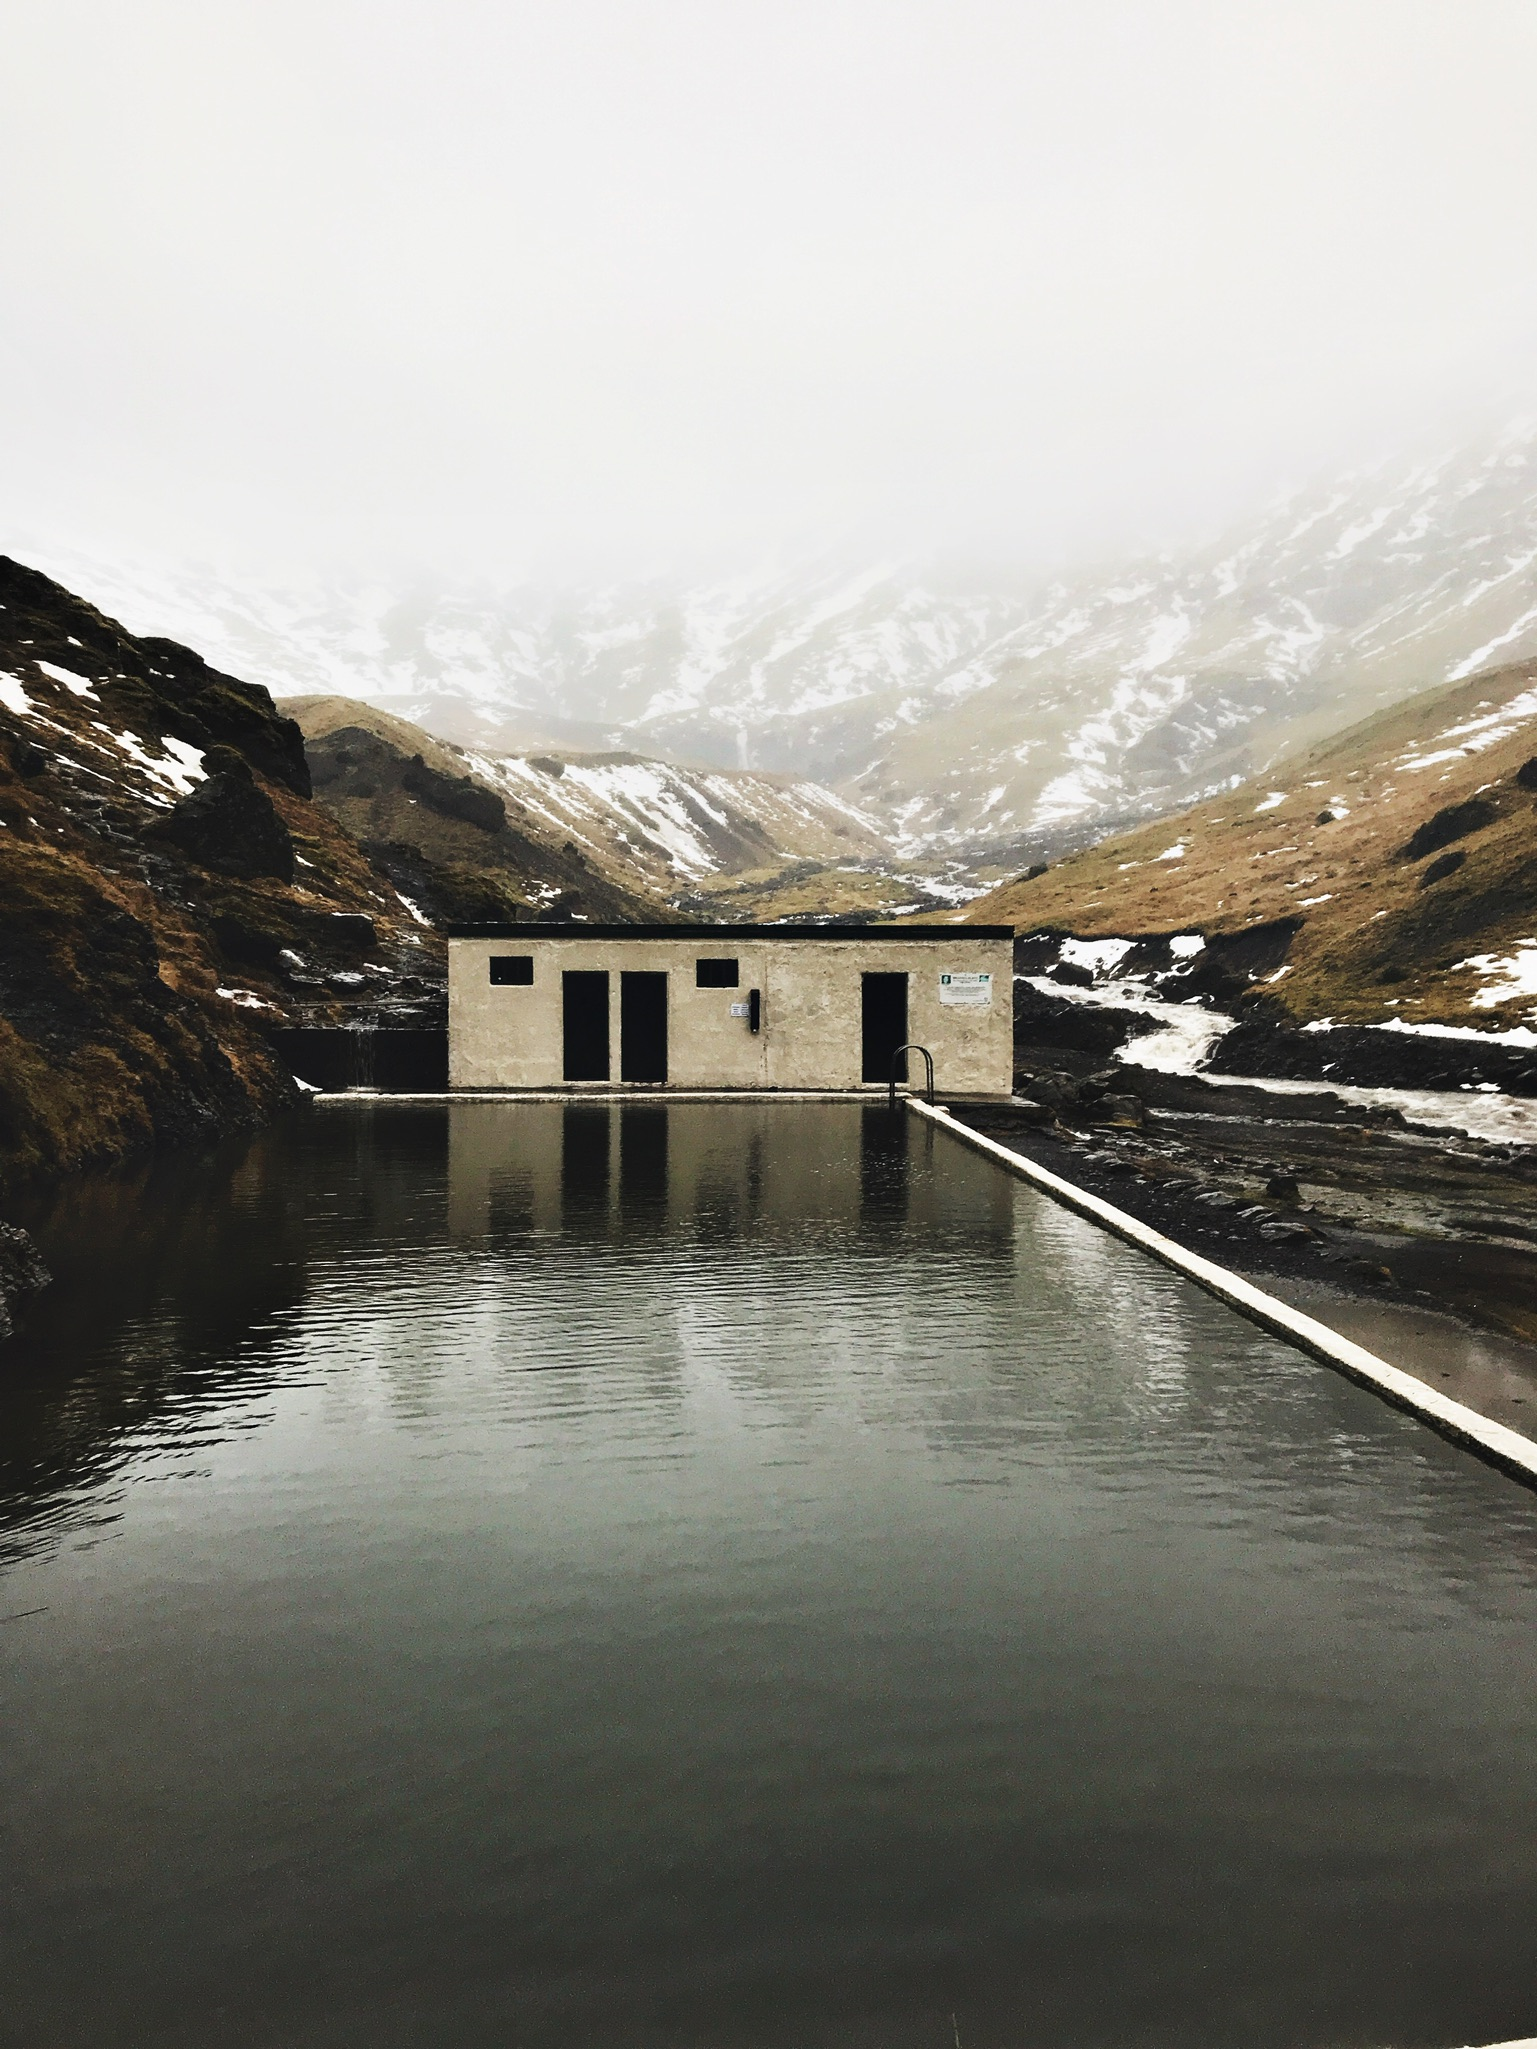 Seljavallalaug hot spring swimming pool